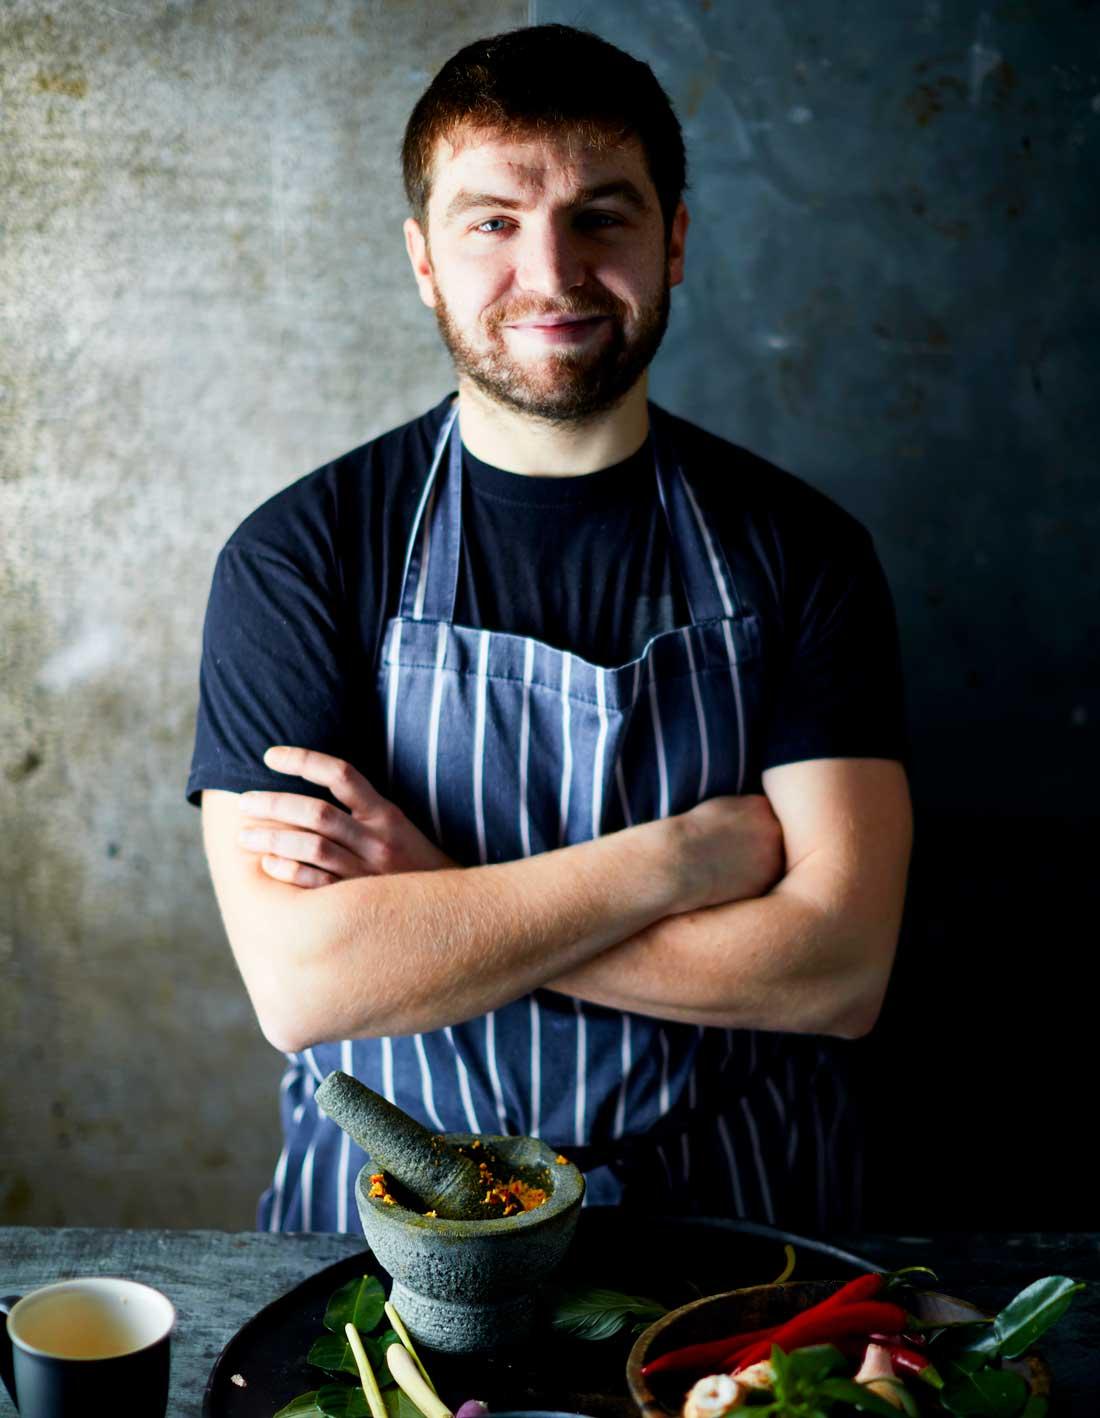 Portrait of Sebby Holmes – Head chef of Farang Thai Restaurant in Highgate, London